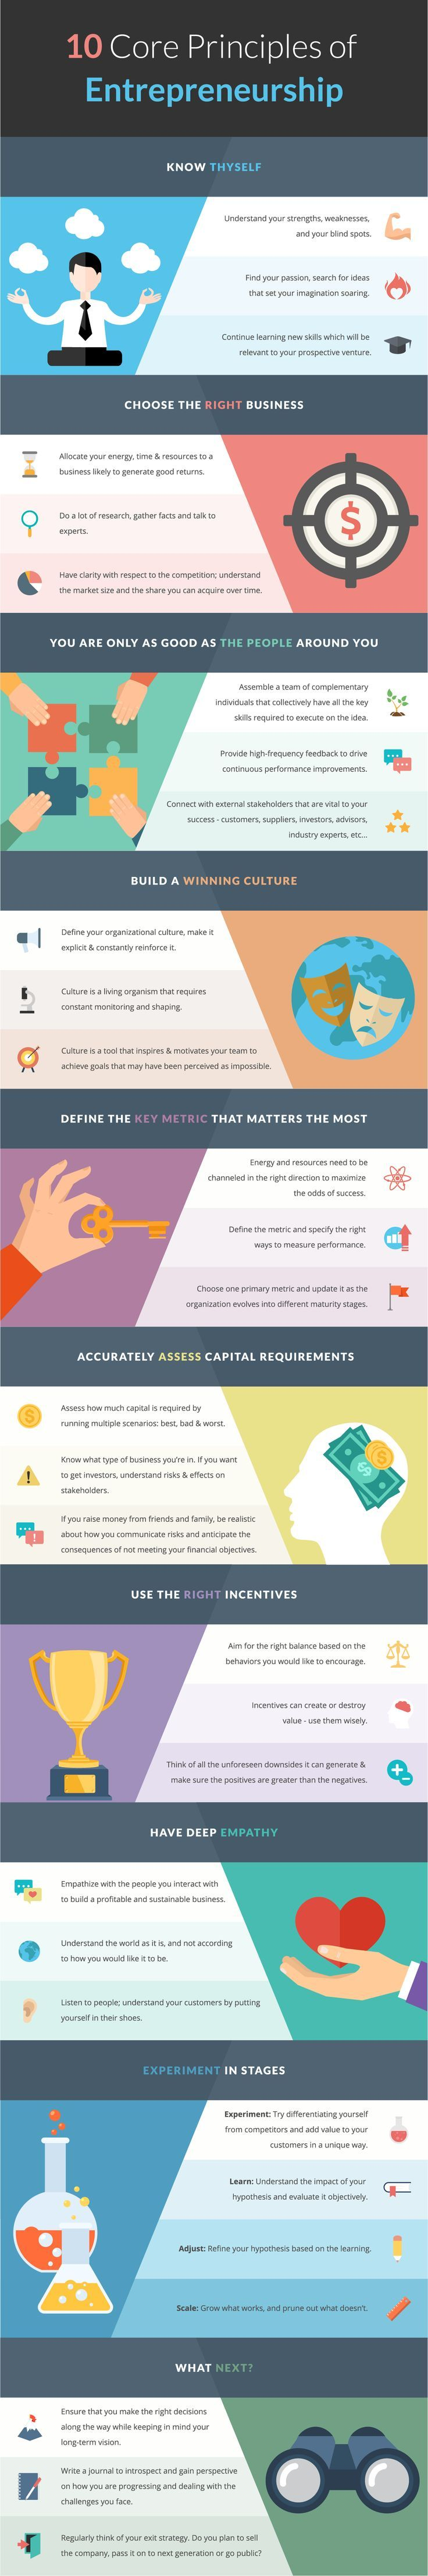 10 Core Principles of Entrepreneurship #infographic #Entrepreneurship #Business: